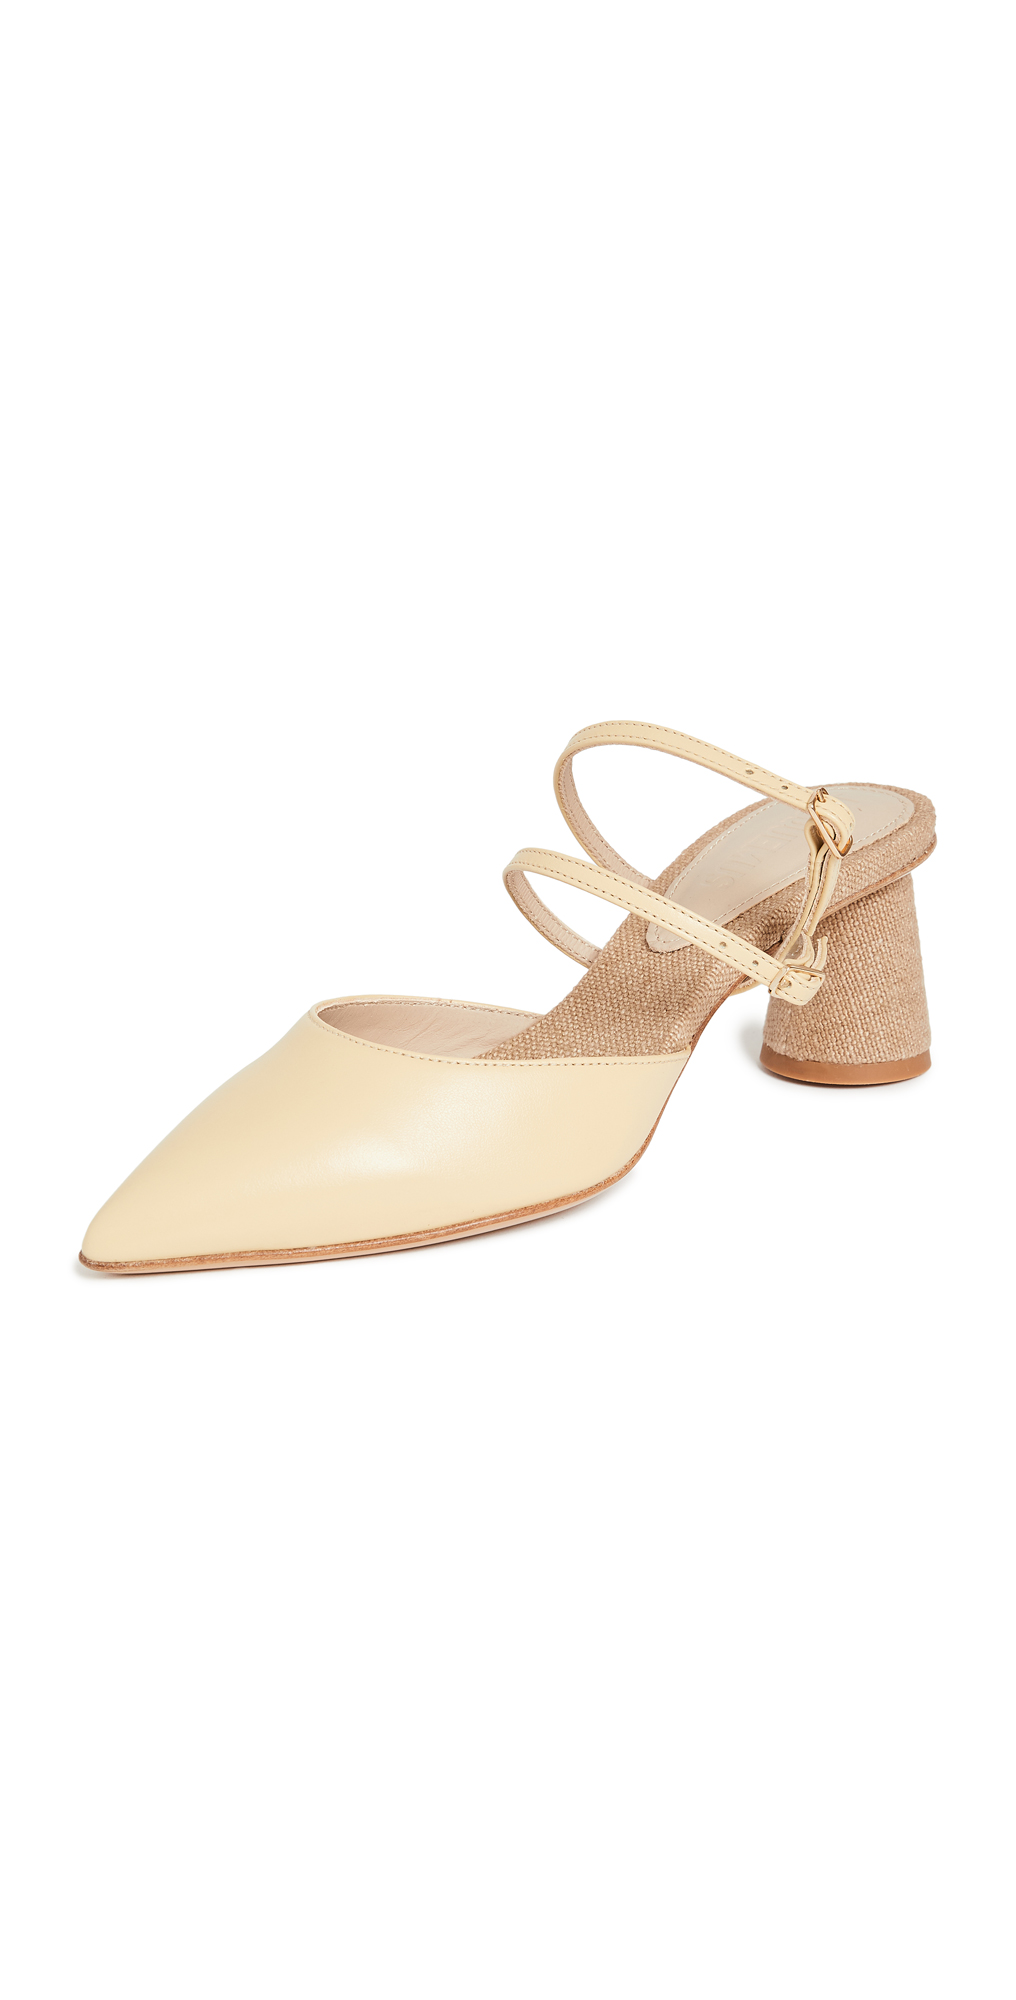 Jacquemus Les Chaussures Basgia Mules